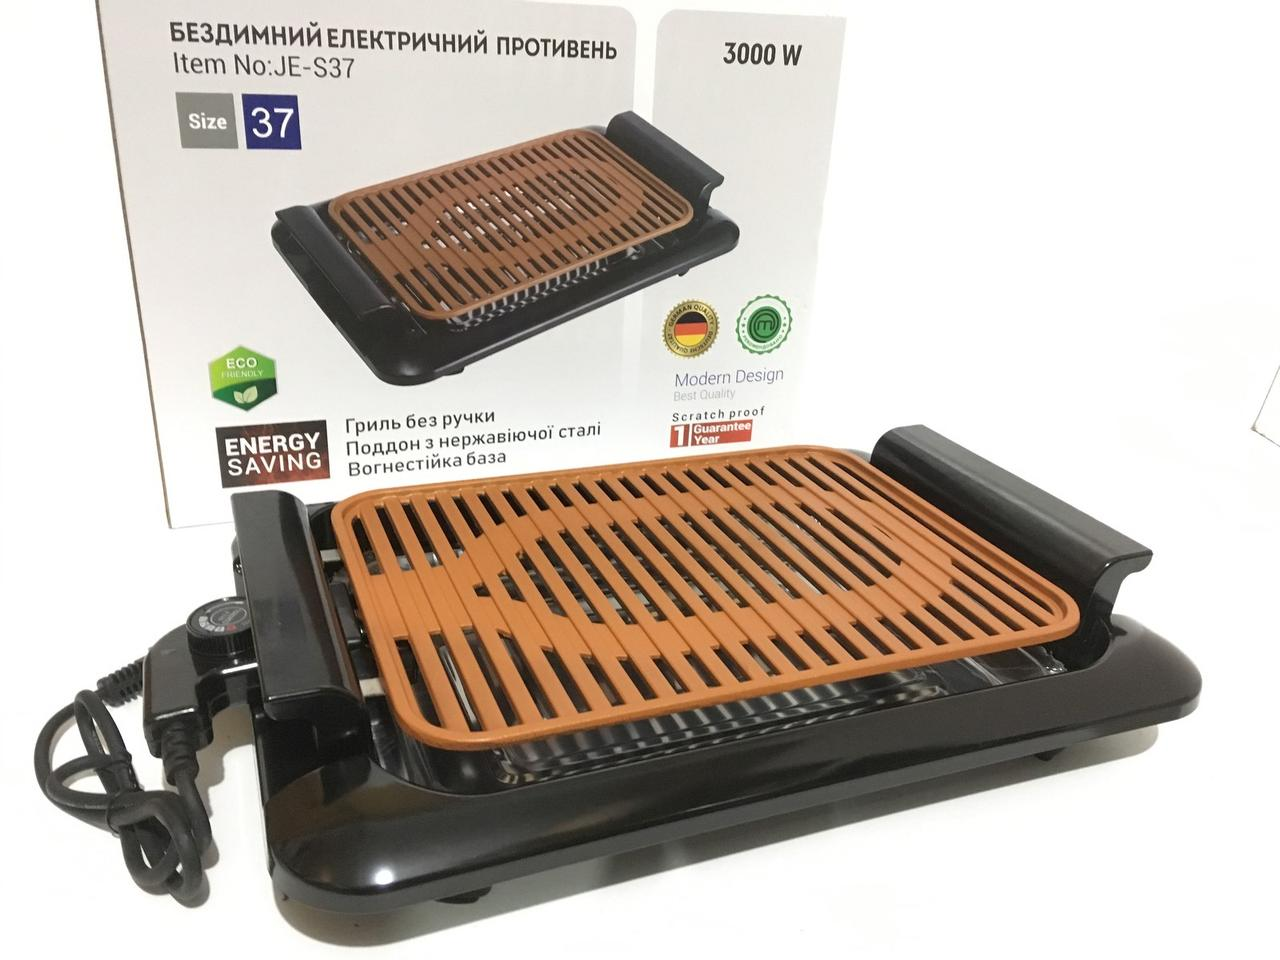 Электрический противень JE-S37 3000W (6шт/ящ)